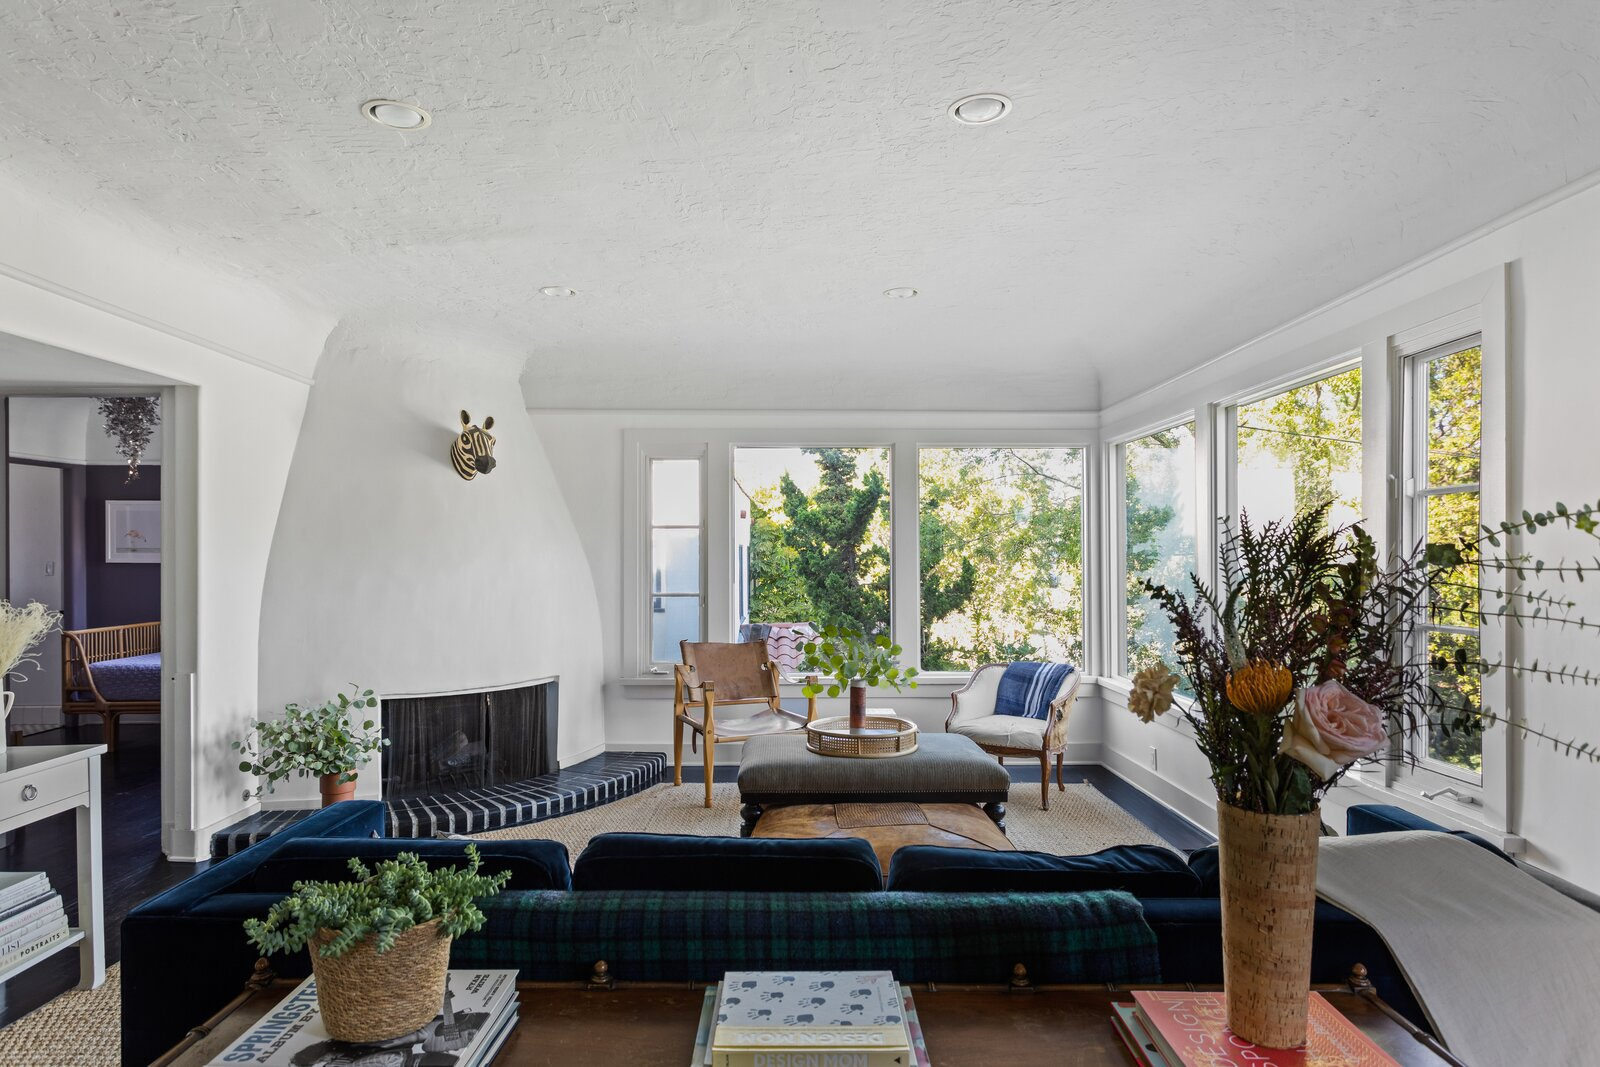 1920s Spanish Revival home living room